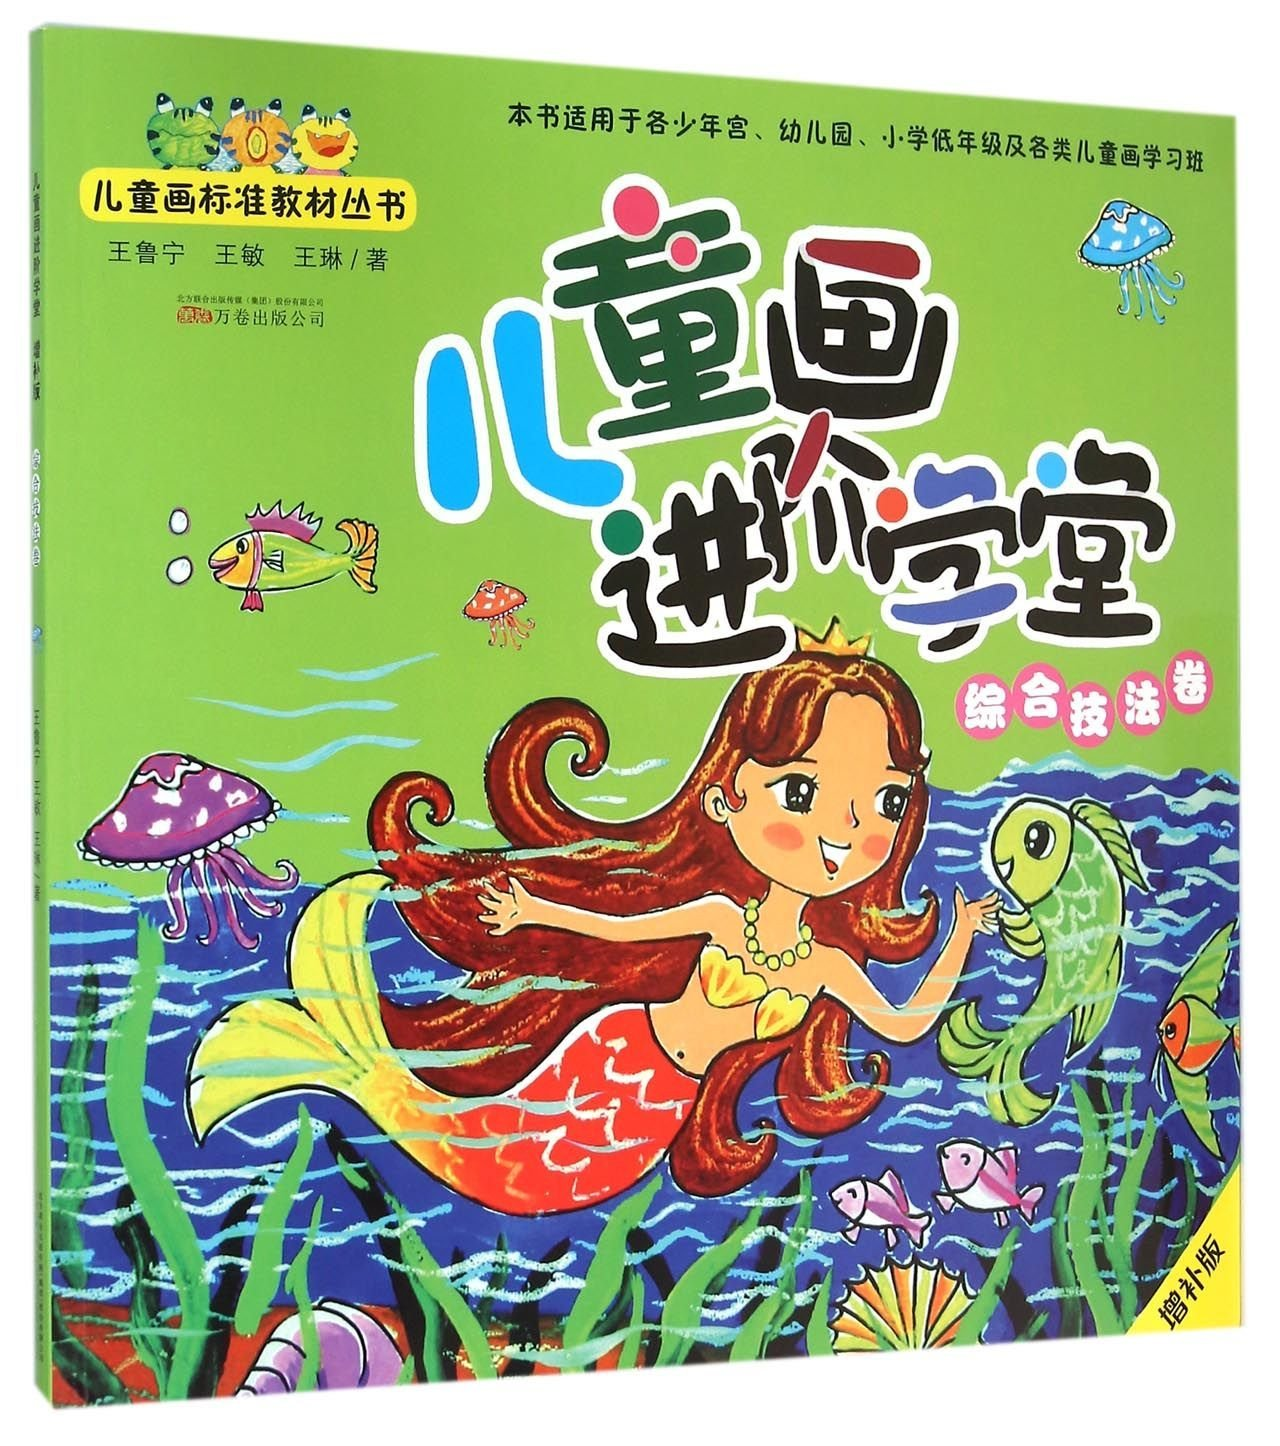 Download 儿童画进阶学堂(综合技法卷增补版)/儿童画标准教材丛书 PDF